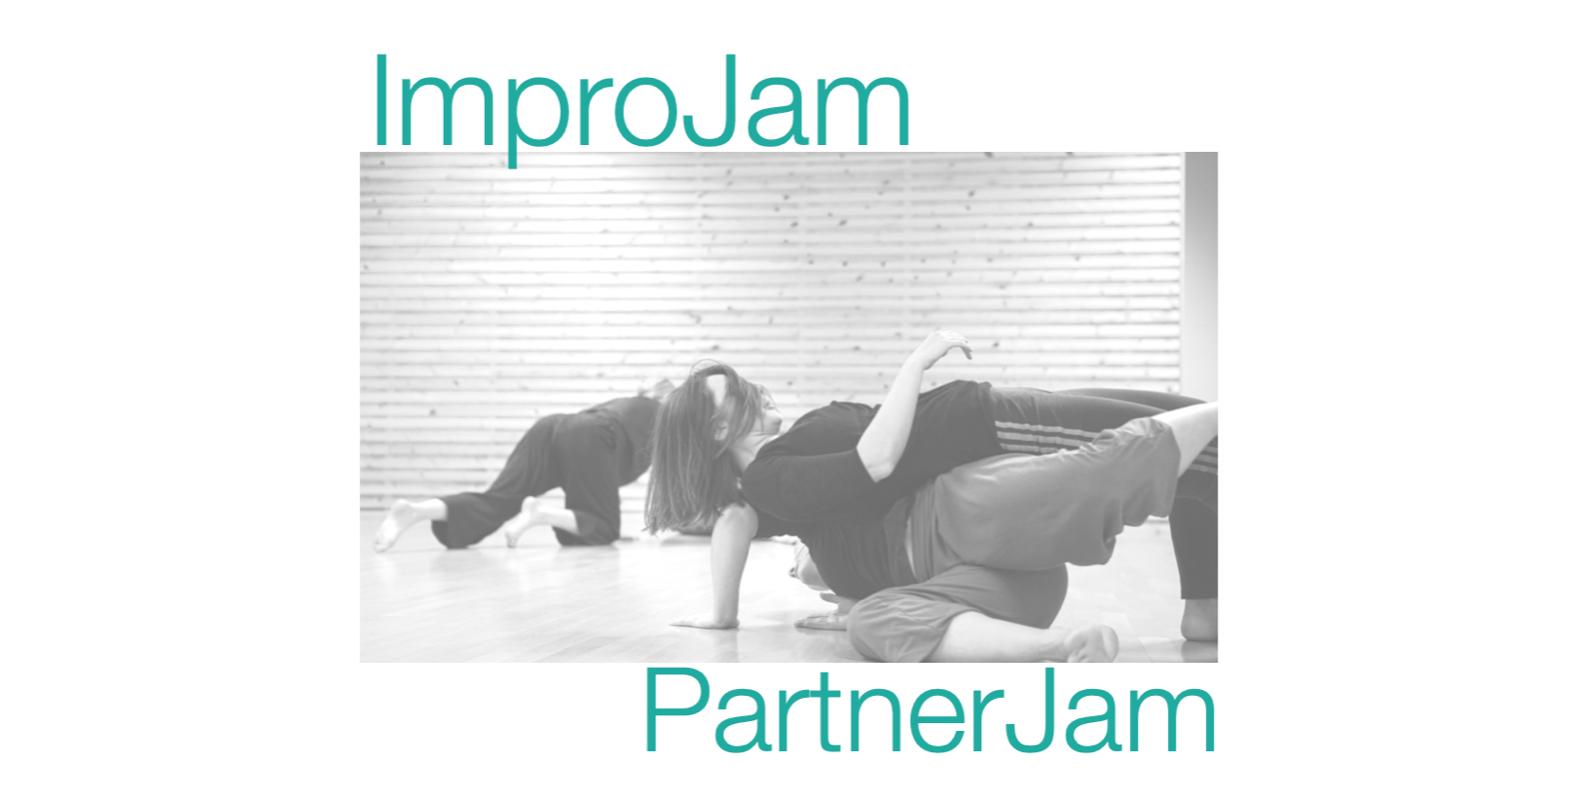 ImproJam - PartnerJam